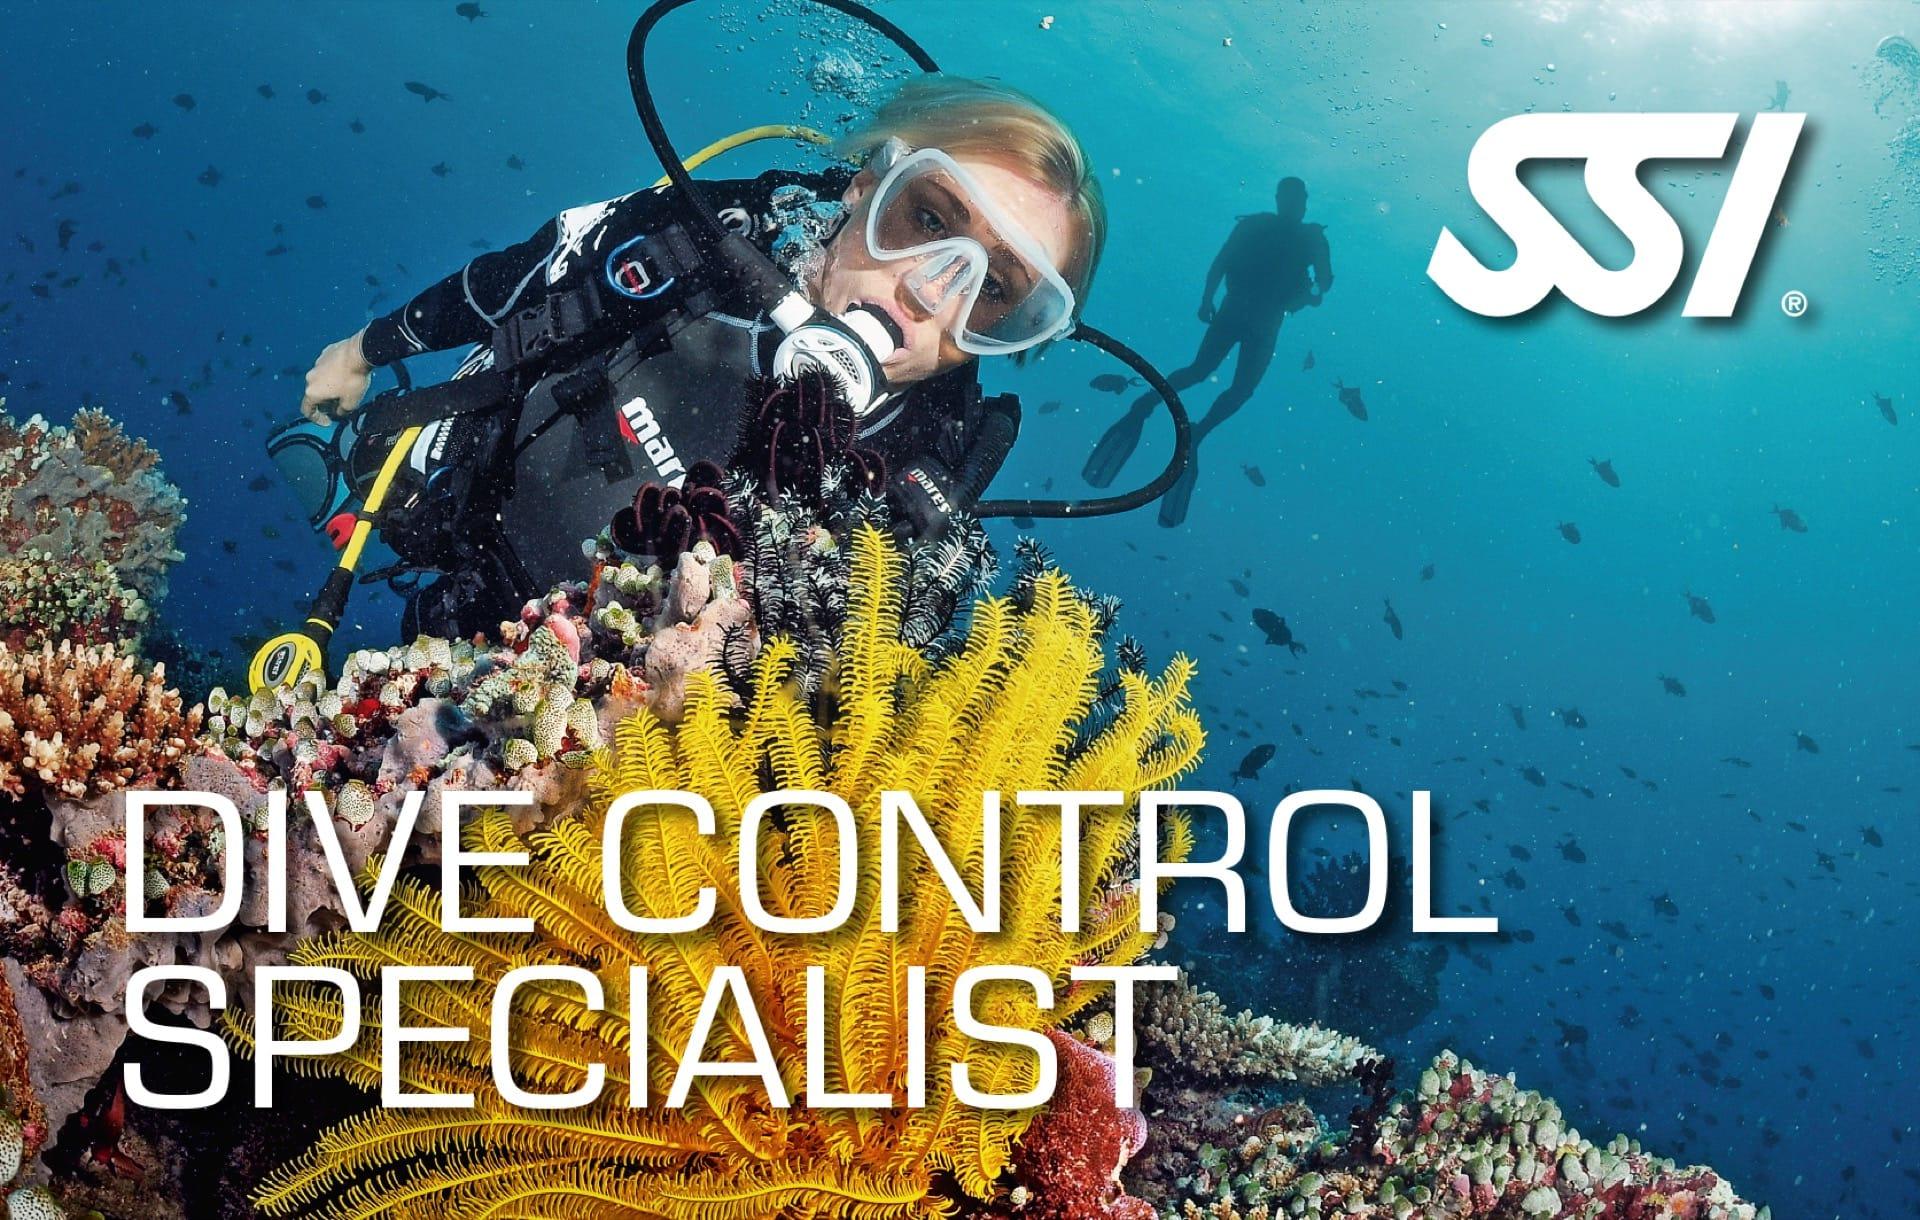 SSI Dive Control Specialist   SSI Dive Control Specialist Course   Dive Control Specialist   Diving Course   Amazing Dive